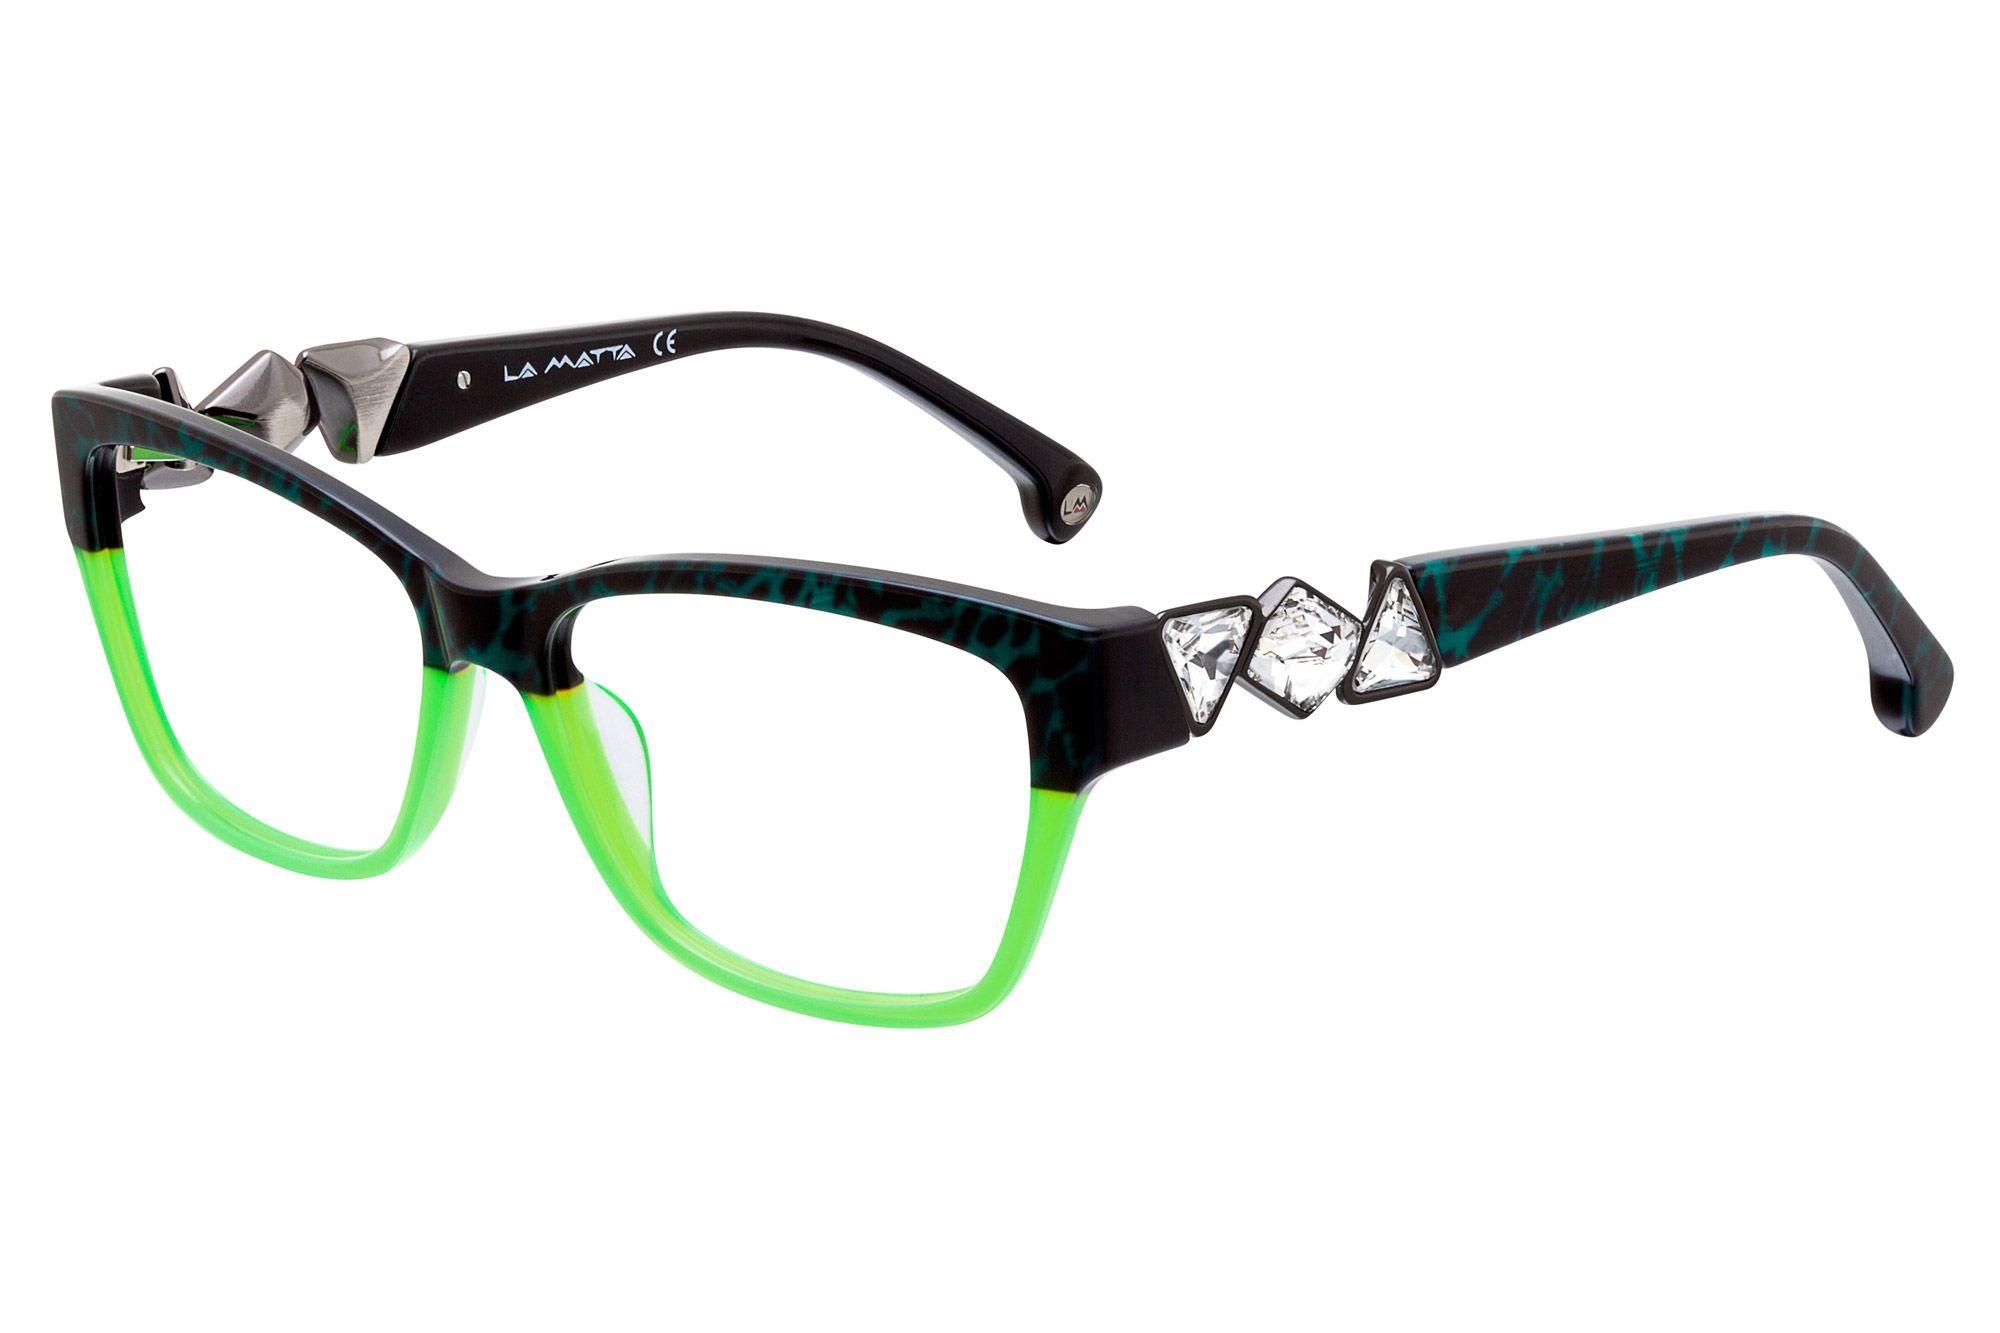 La Matta Eyewear by Area98 - Mod. LM3182 #eyewear #glasses #frame #women #style #accessories #fashion